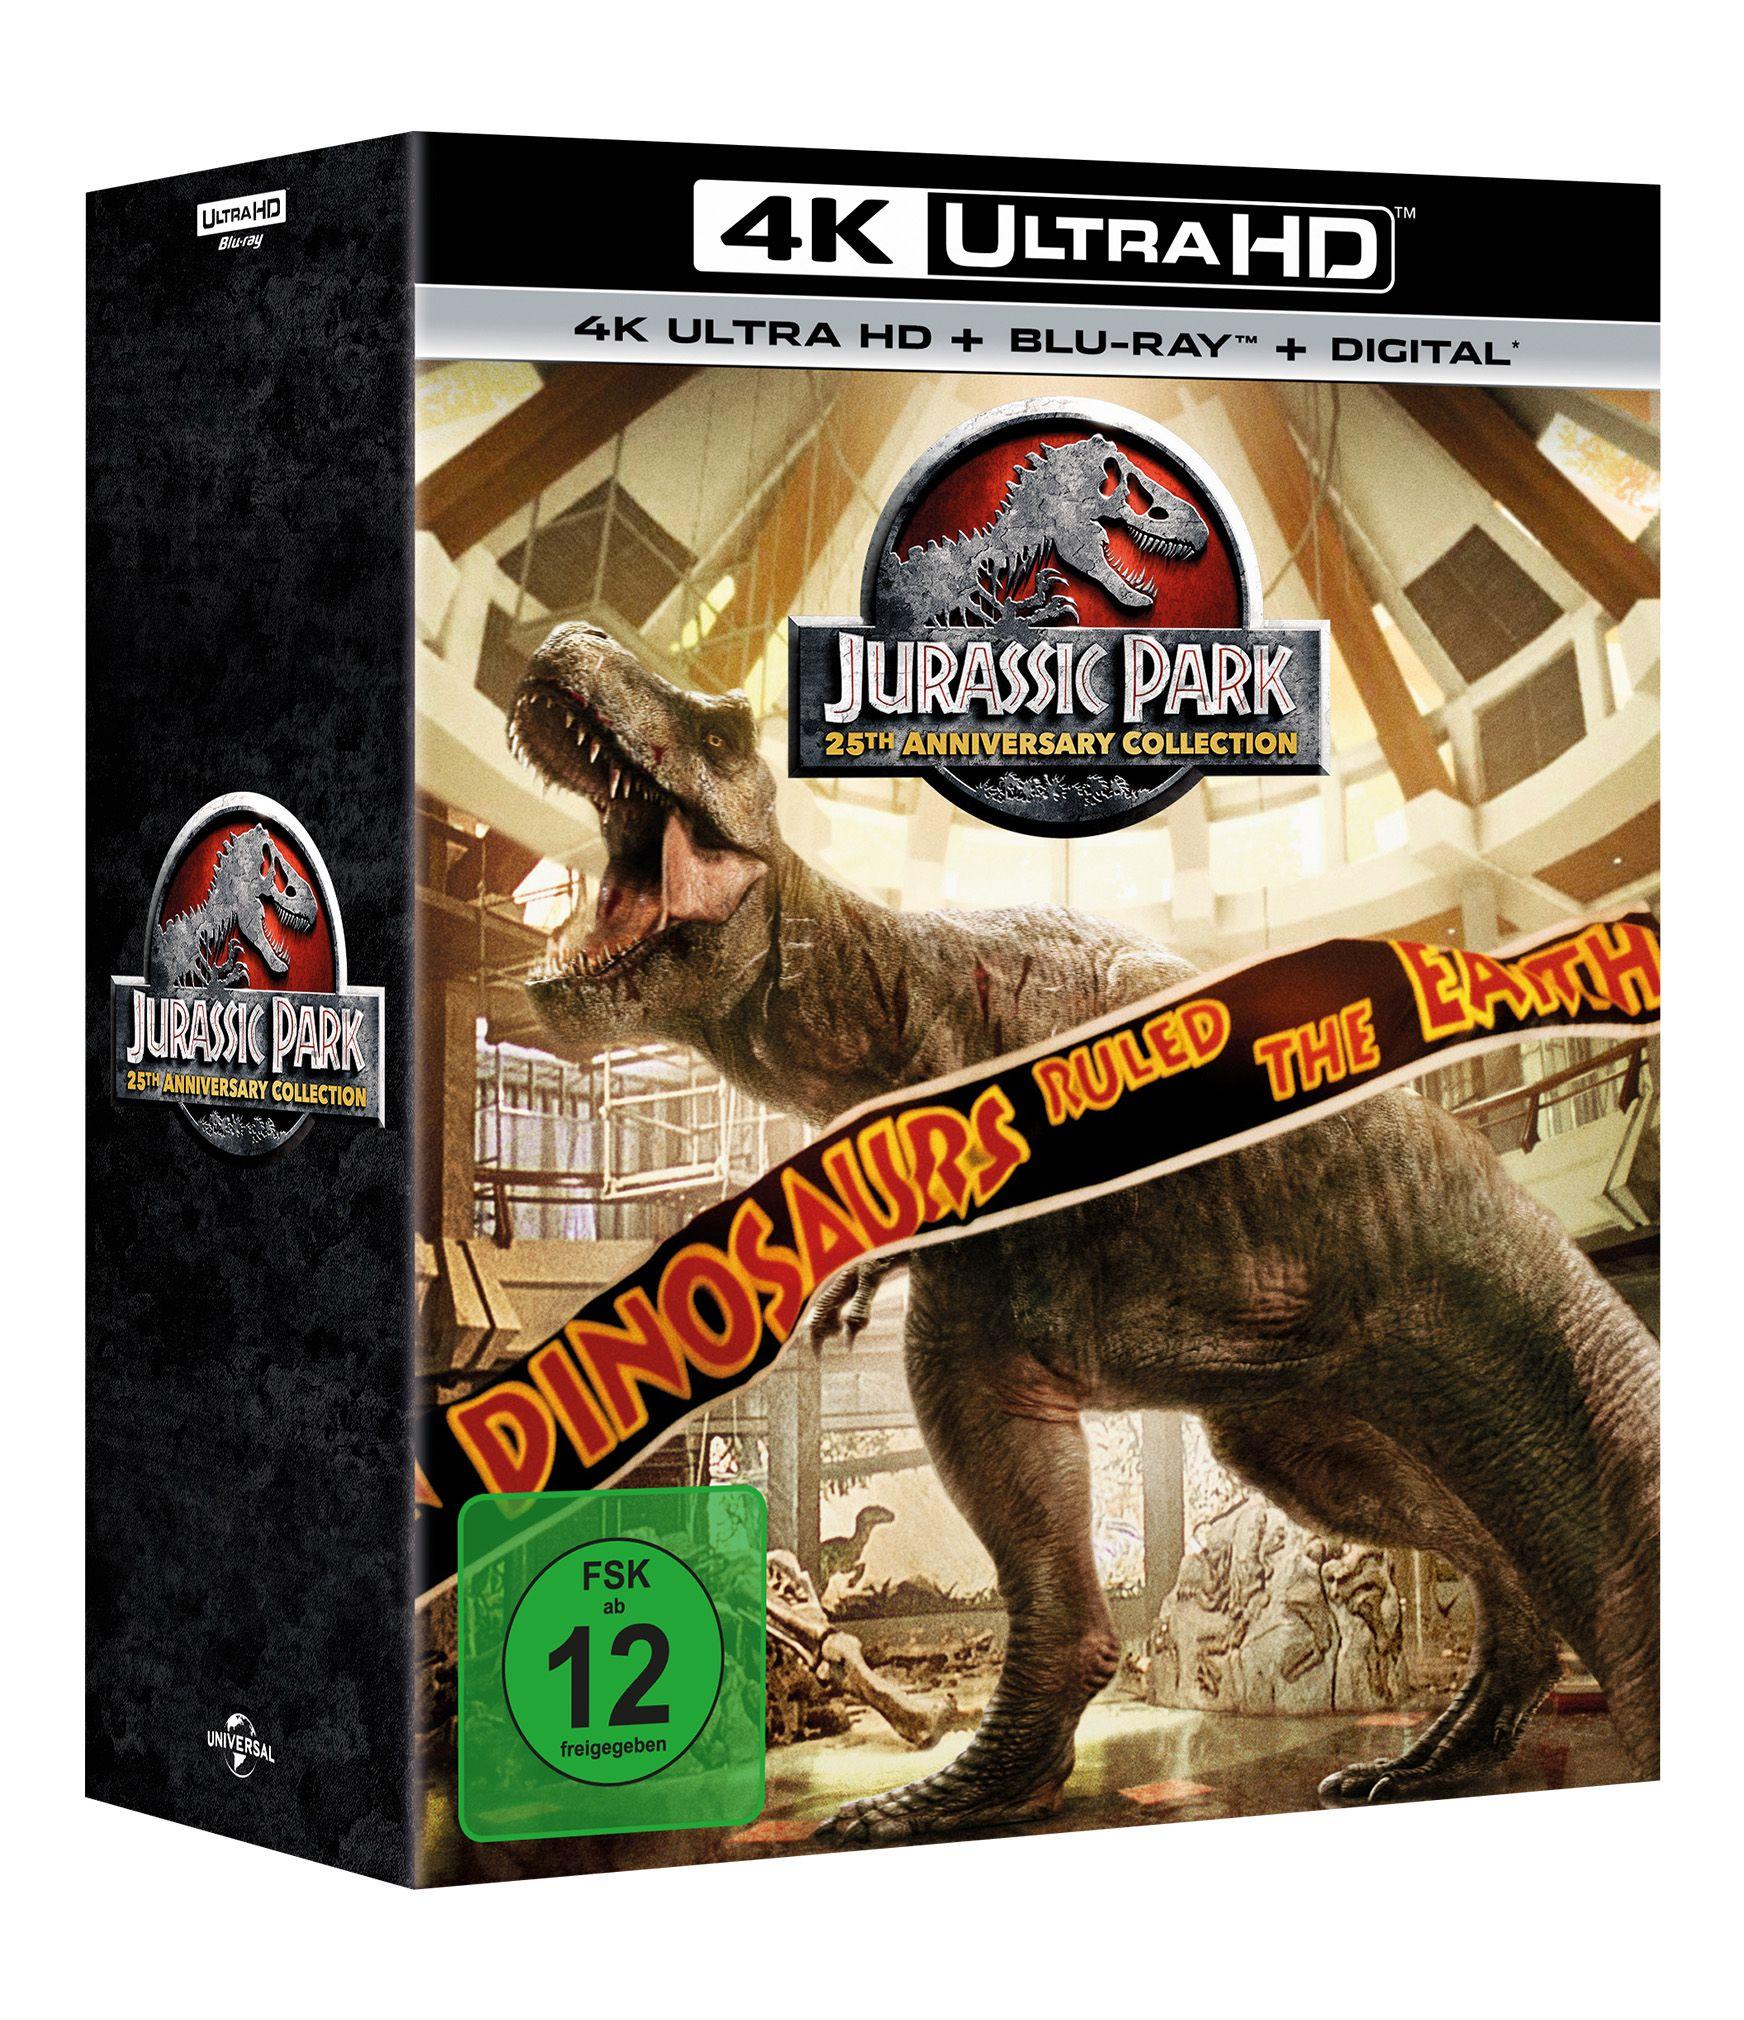 Jurassic Park 14 (Steelbook) (25th Anniversary Edition